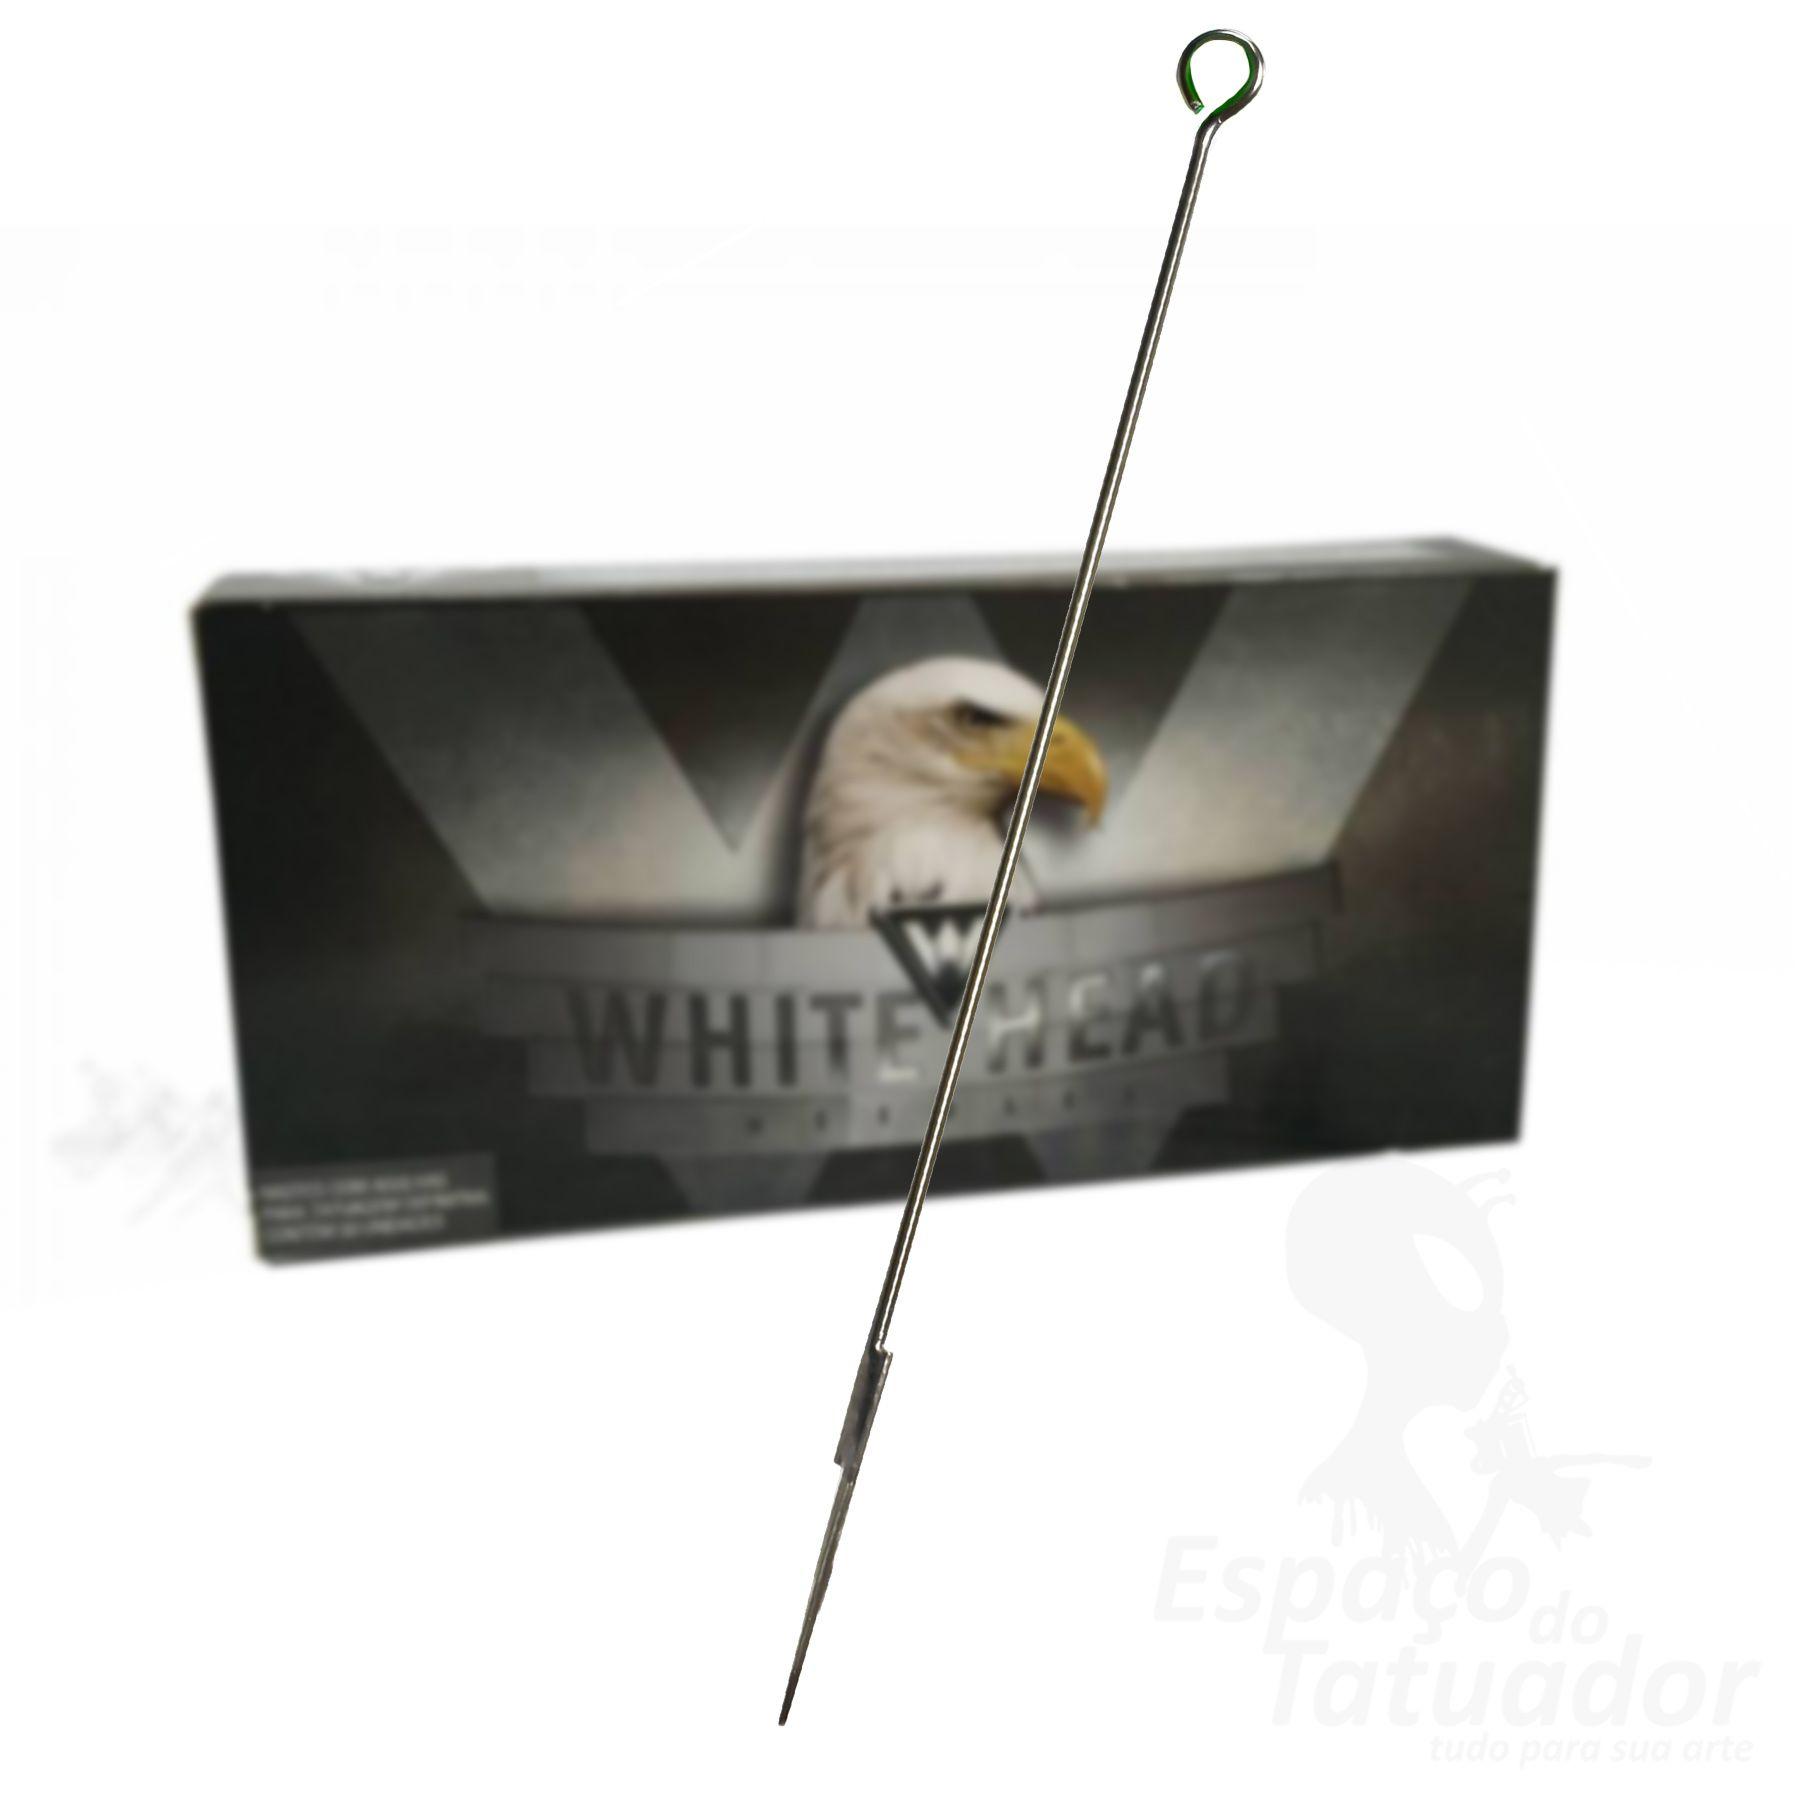 Agulha White Head - RL 1009 - Caixa com 50 unidades